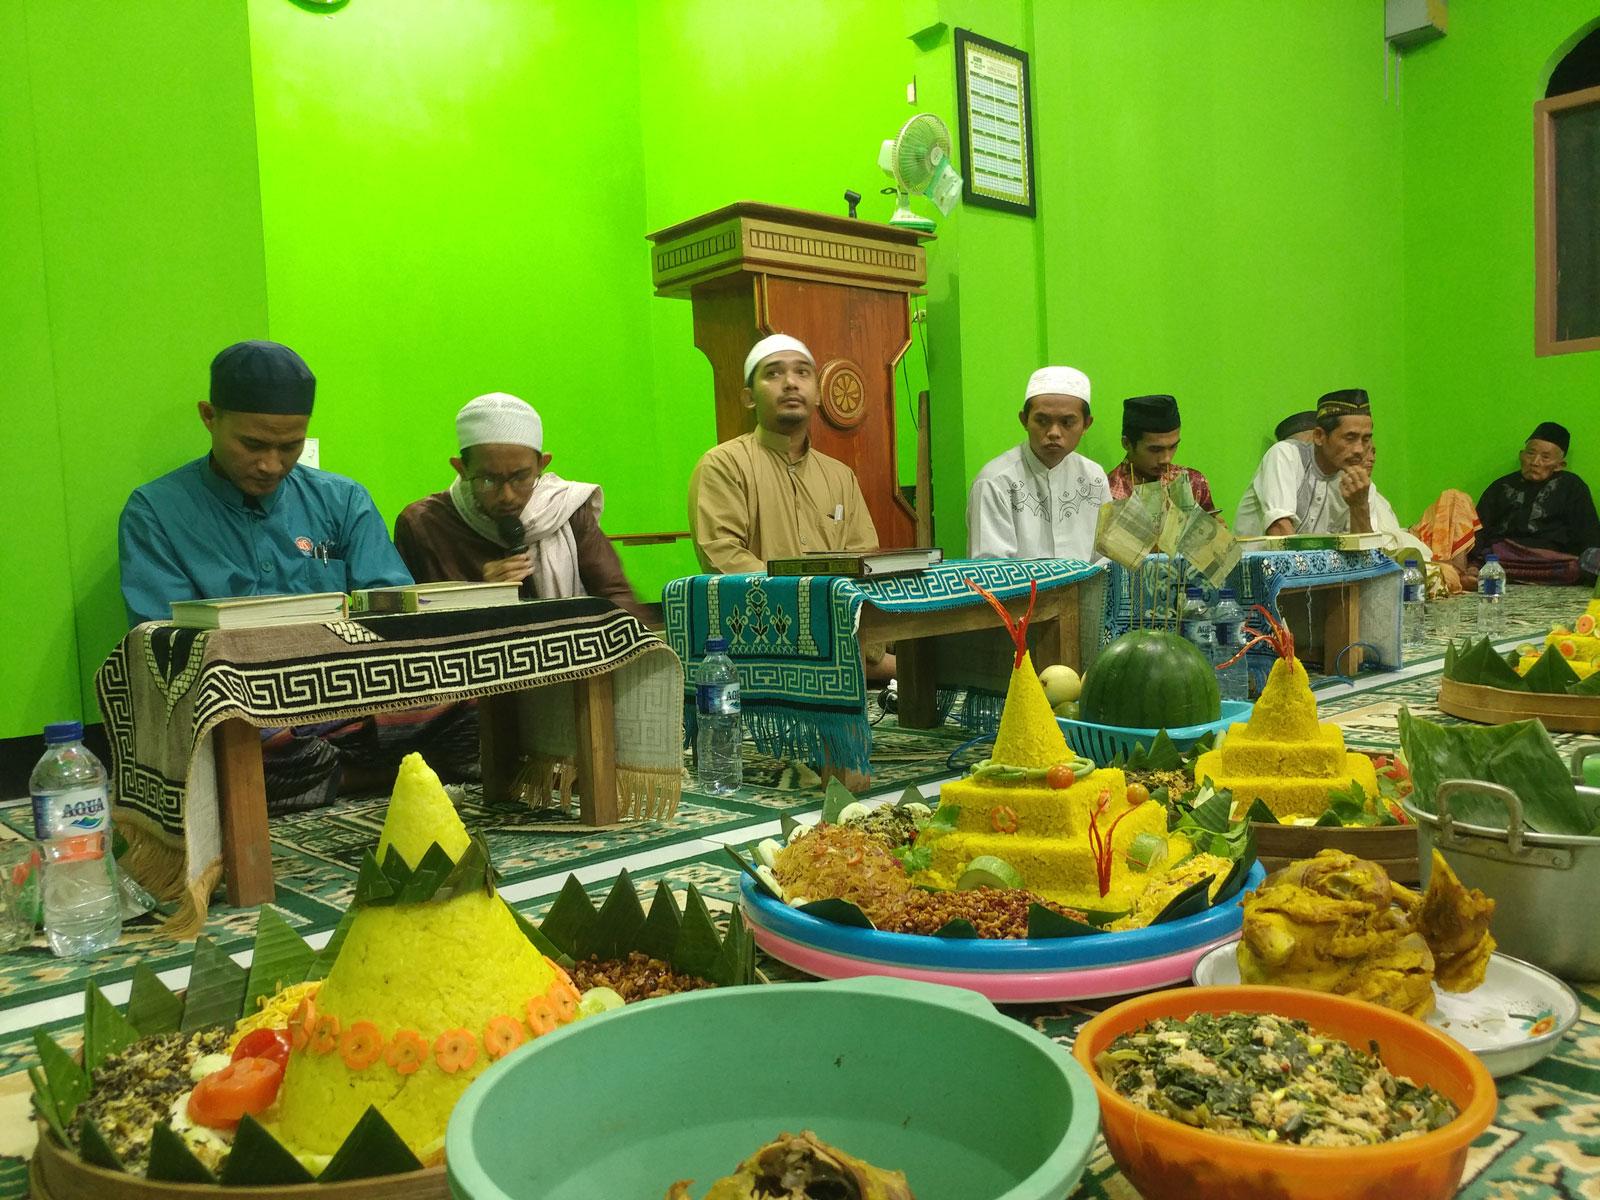 MP3 Rekaman Khataman Qur'an bersama Ustadz Zidan Baslum dan Ustadz Ali Assegaf di Masjid Ar-Rahman Pucung, Eromoko, Wonogiri 2019